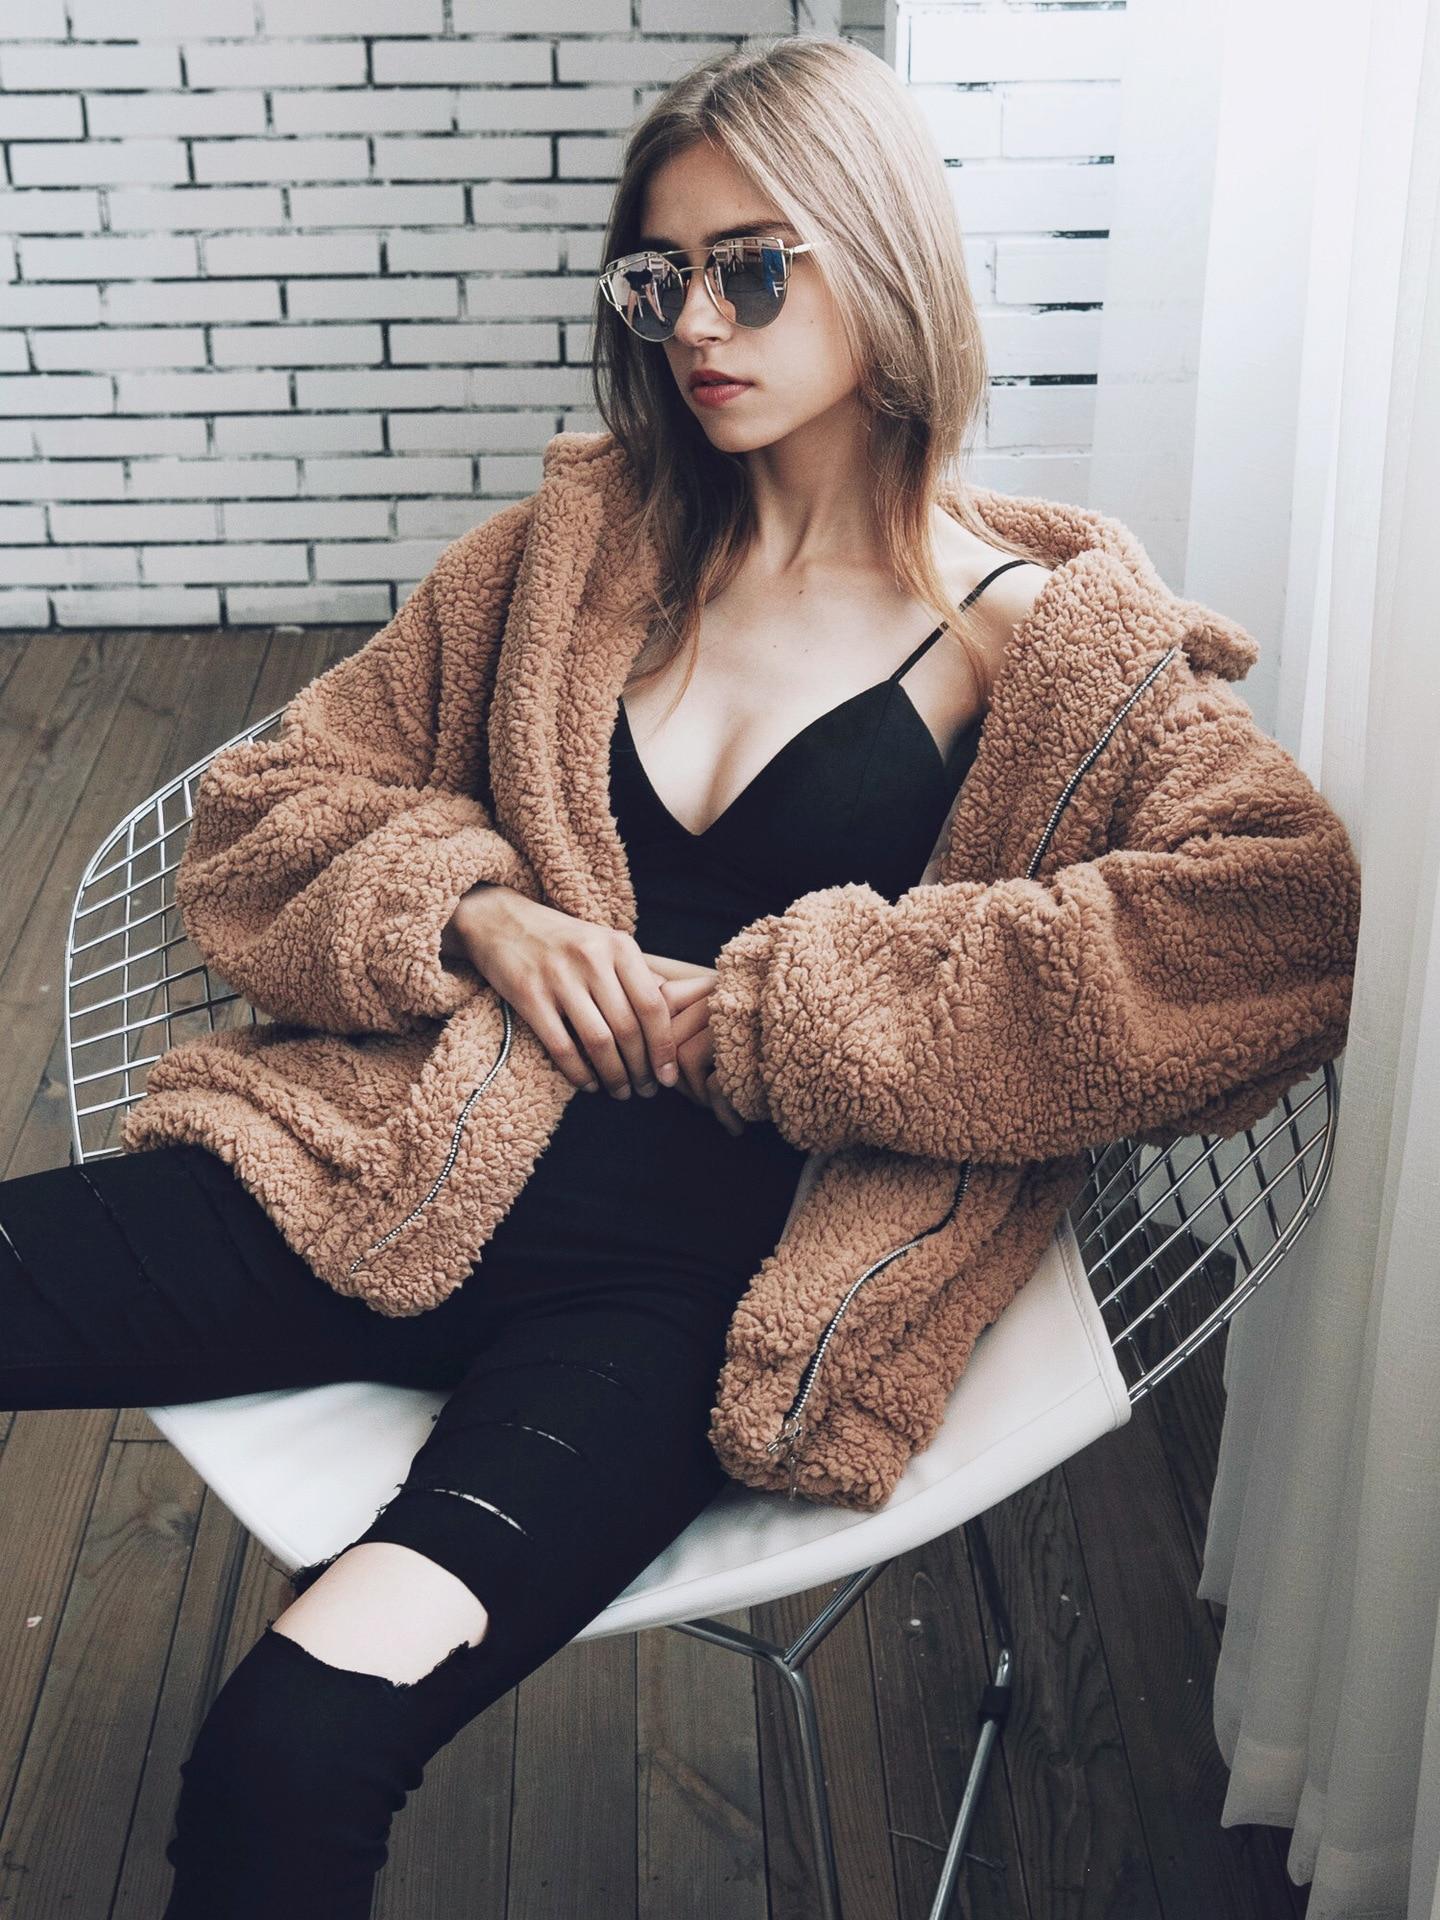 Zogaa Elegant Faux Fur Coat Women Autumn Winter Thick Warm Soft Fleece Jacket Pocket Zipper Outerwear Overcoat Bear Teddy Coat